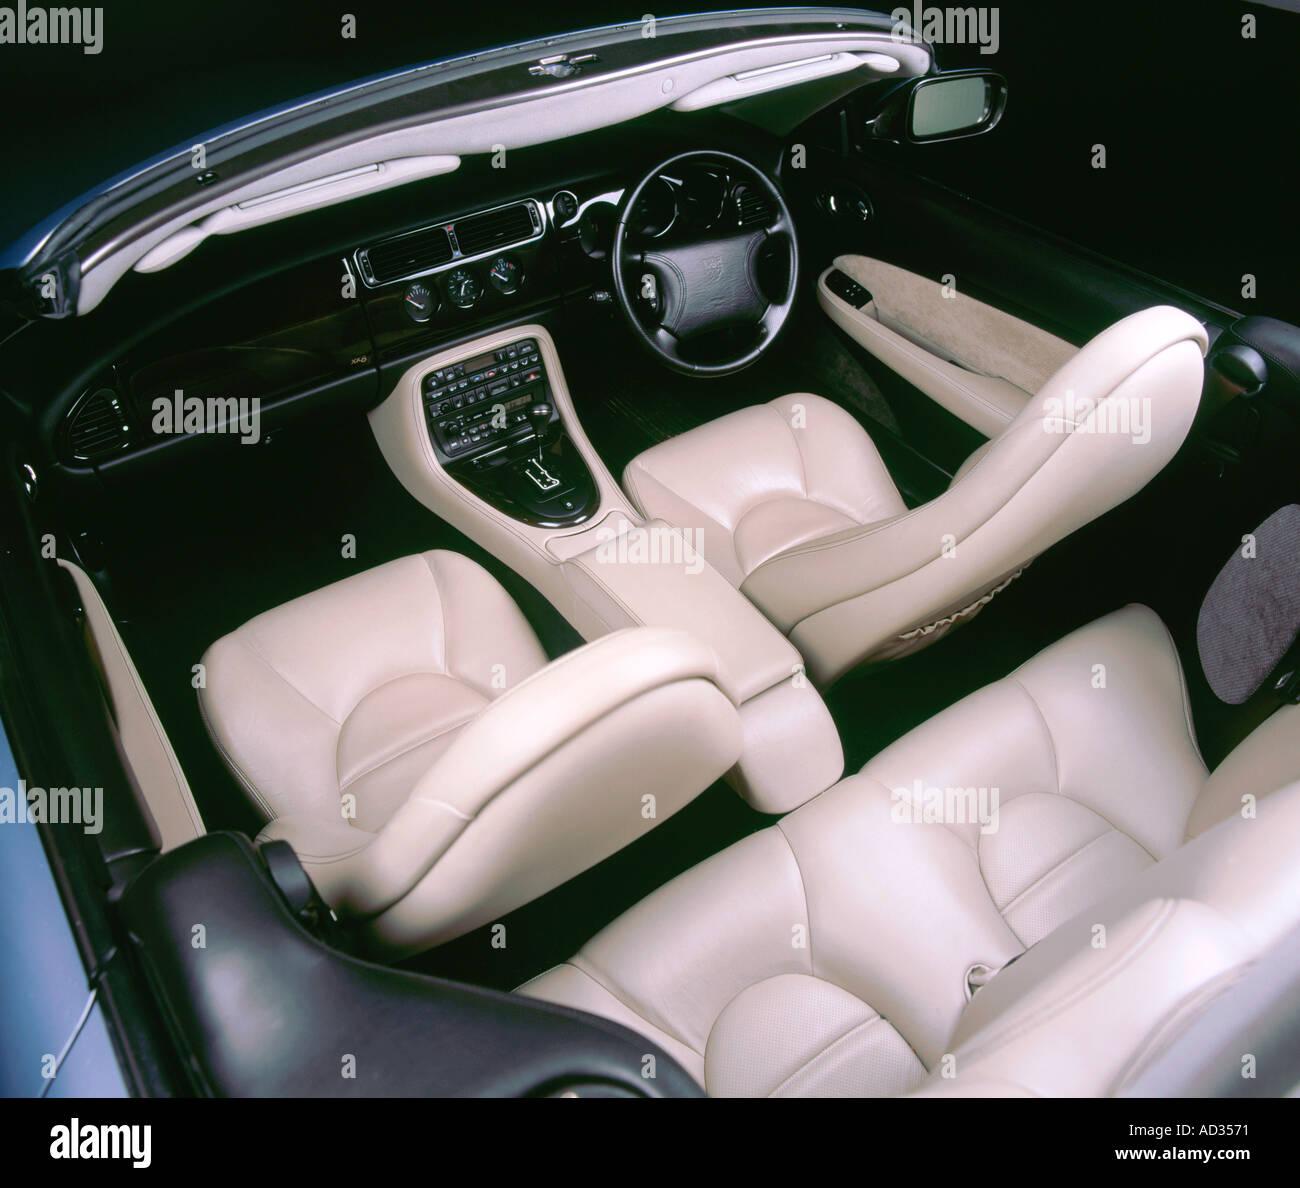 1997 Jaguar XK8 convertible interior - Stock Image